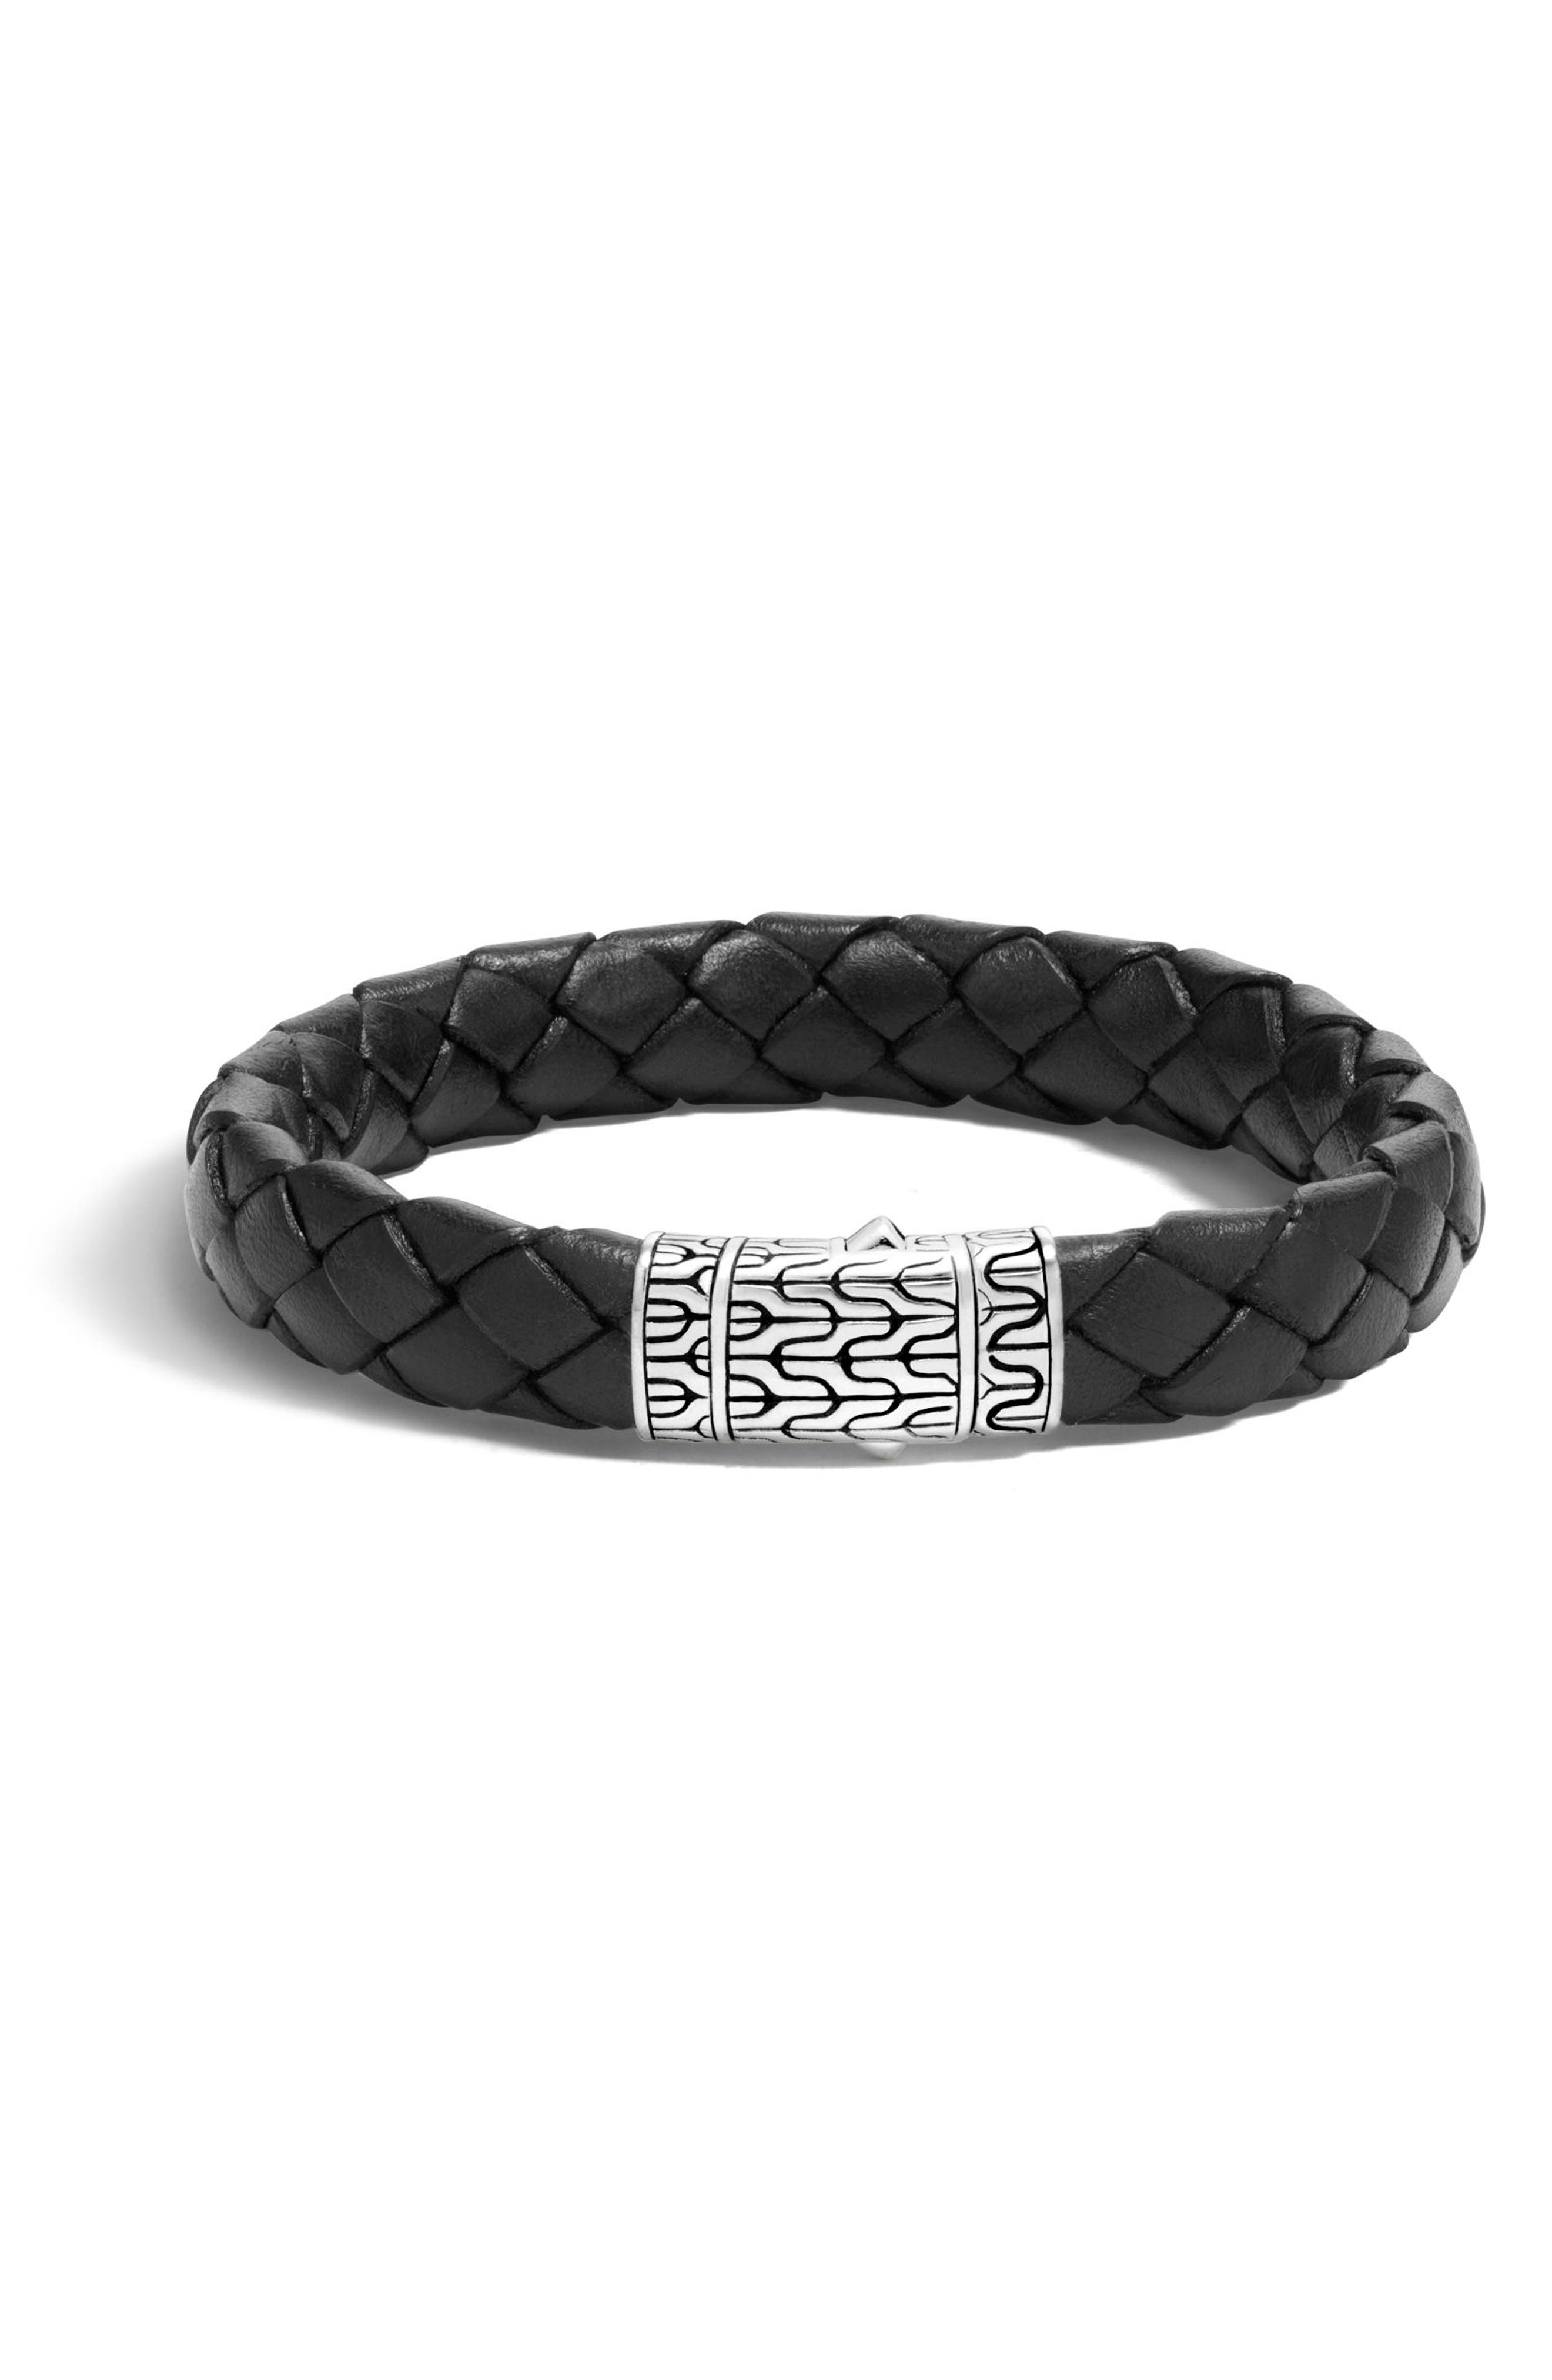 Men's Leather & Sterling Bracelet,                             Main thumbnail 1, color,                             SILVER/ BLACK